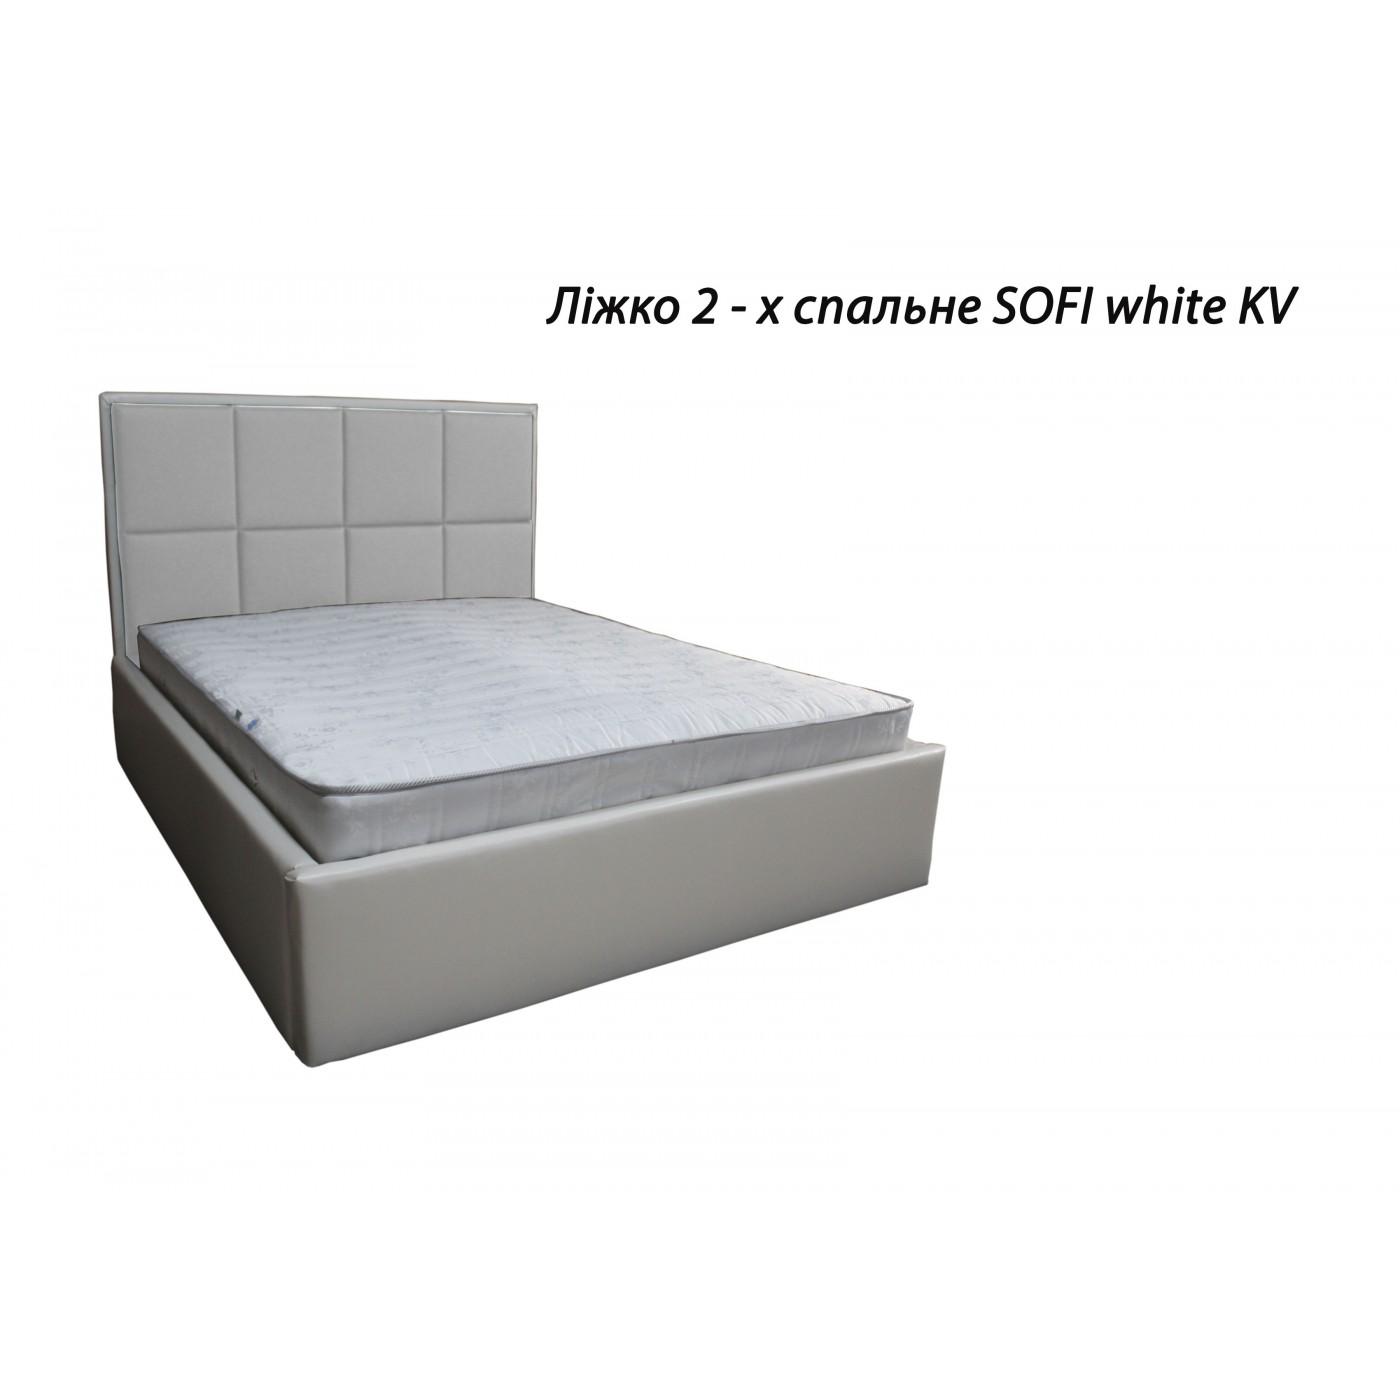 Кровать 2-х спальная SOFI + тумба